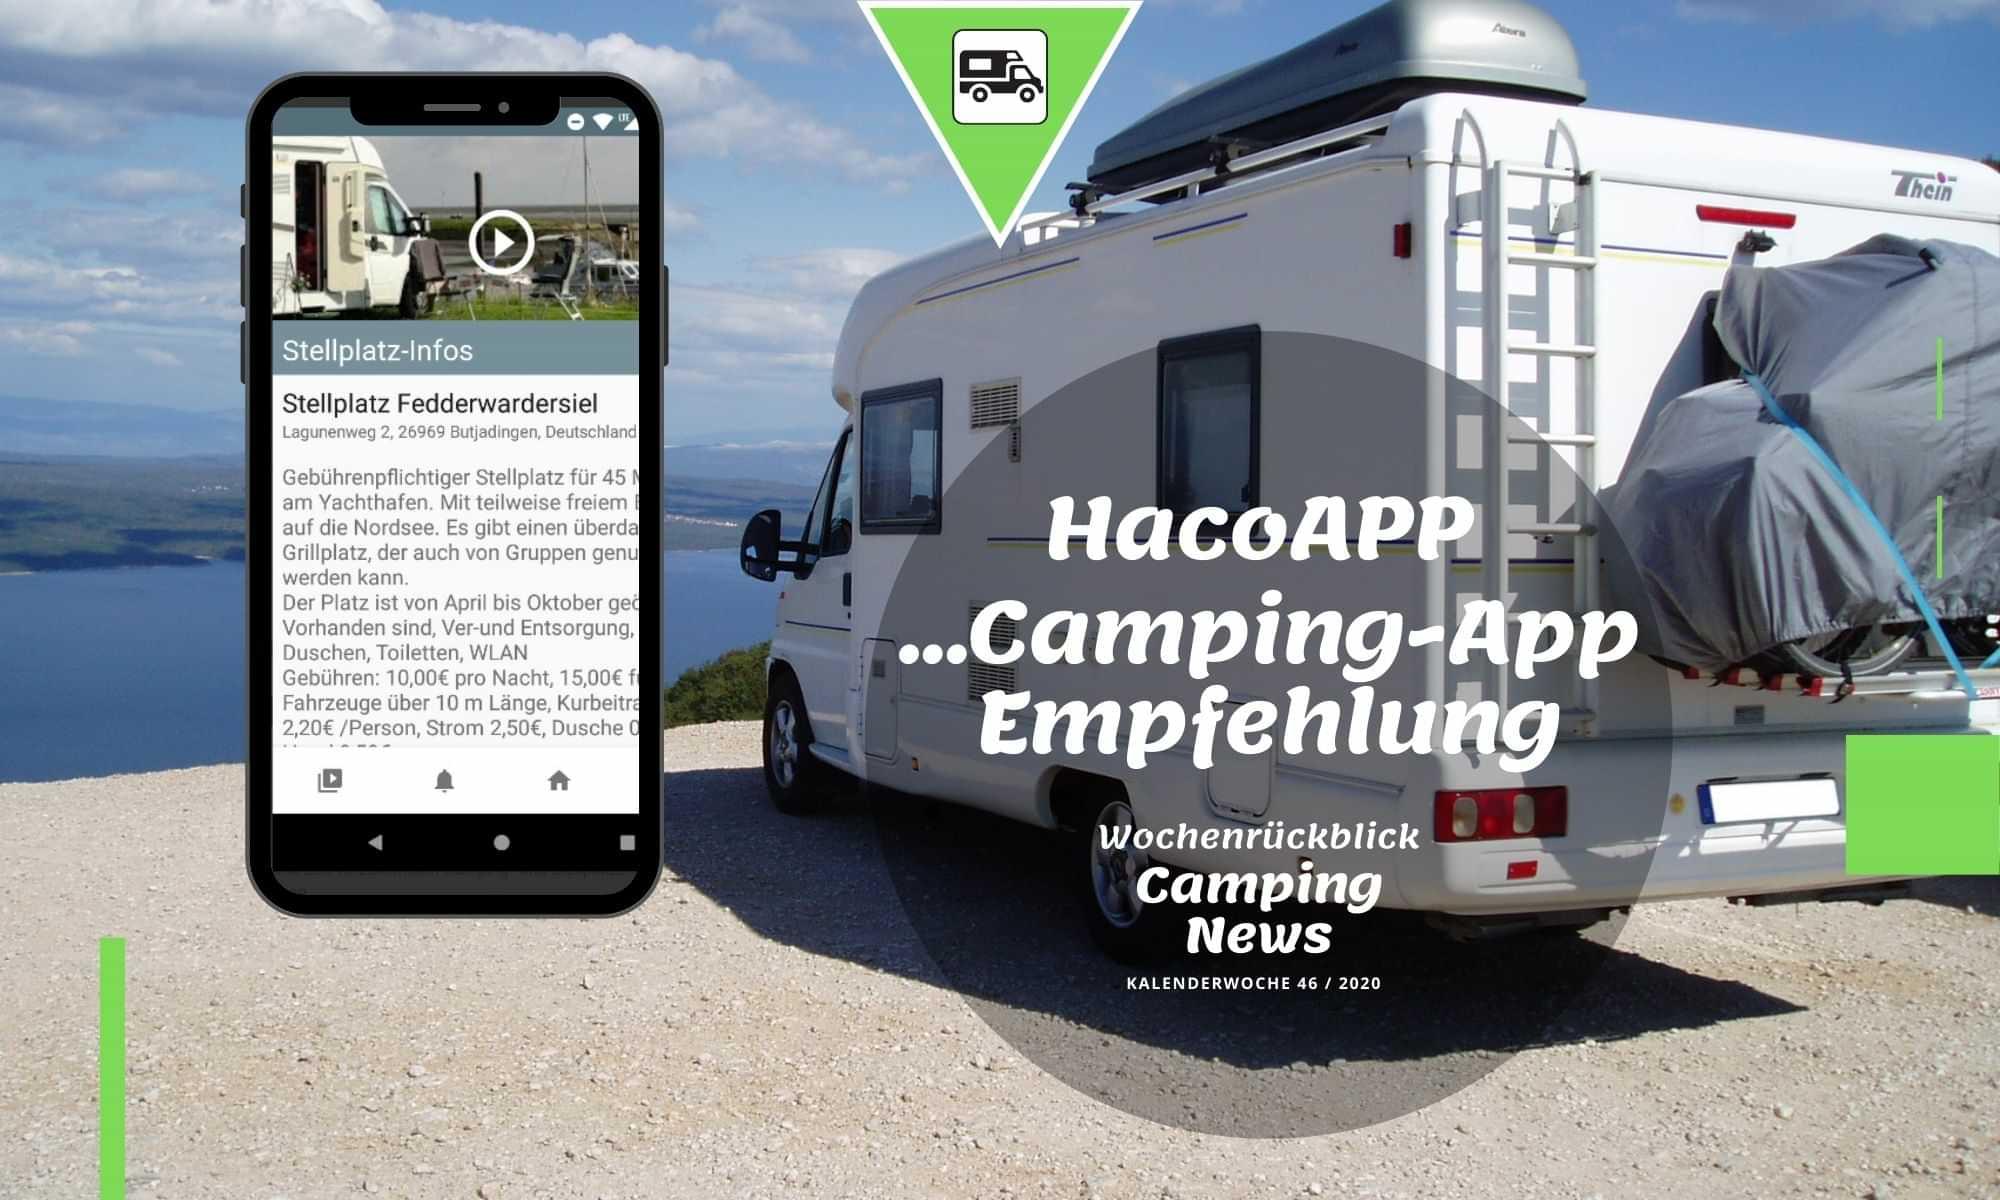 HacoApp Camping-App